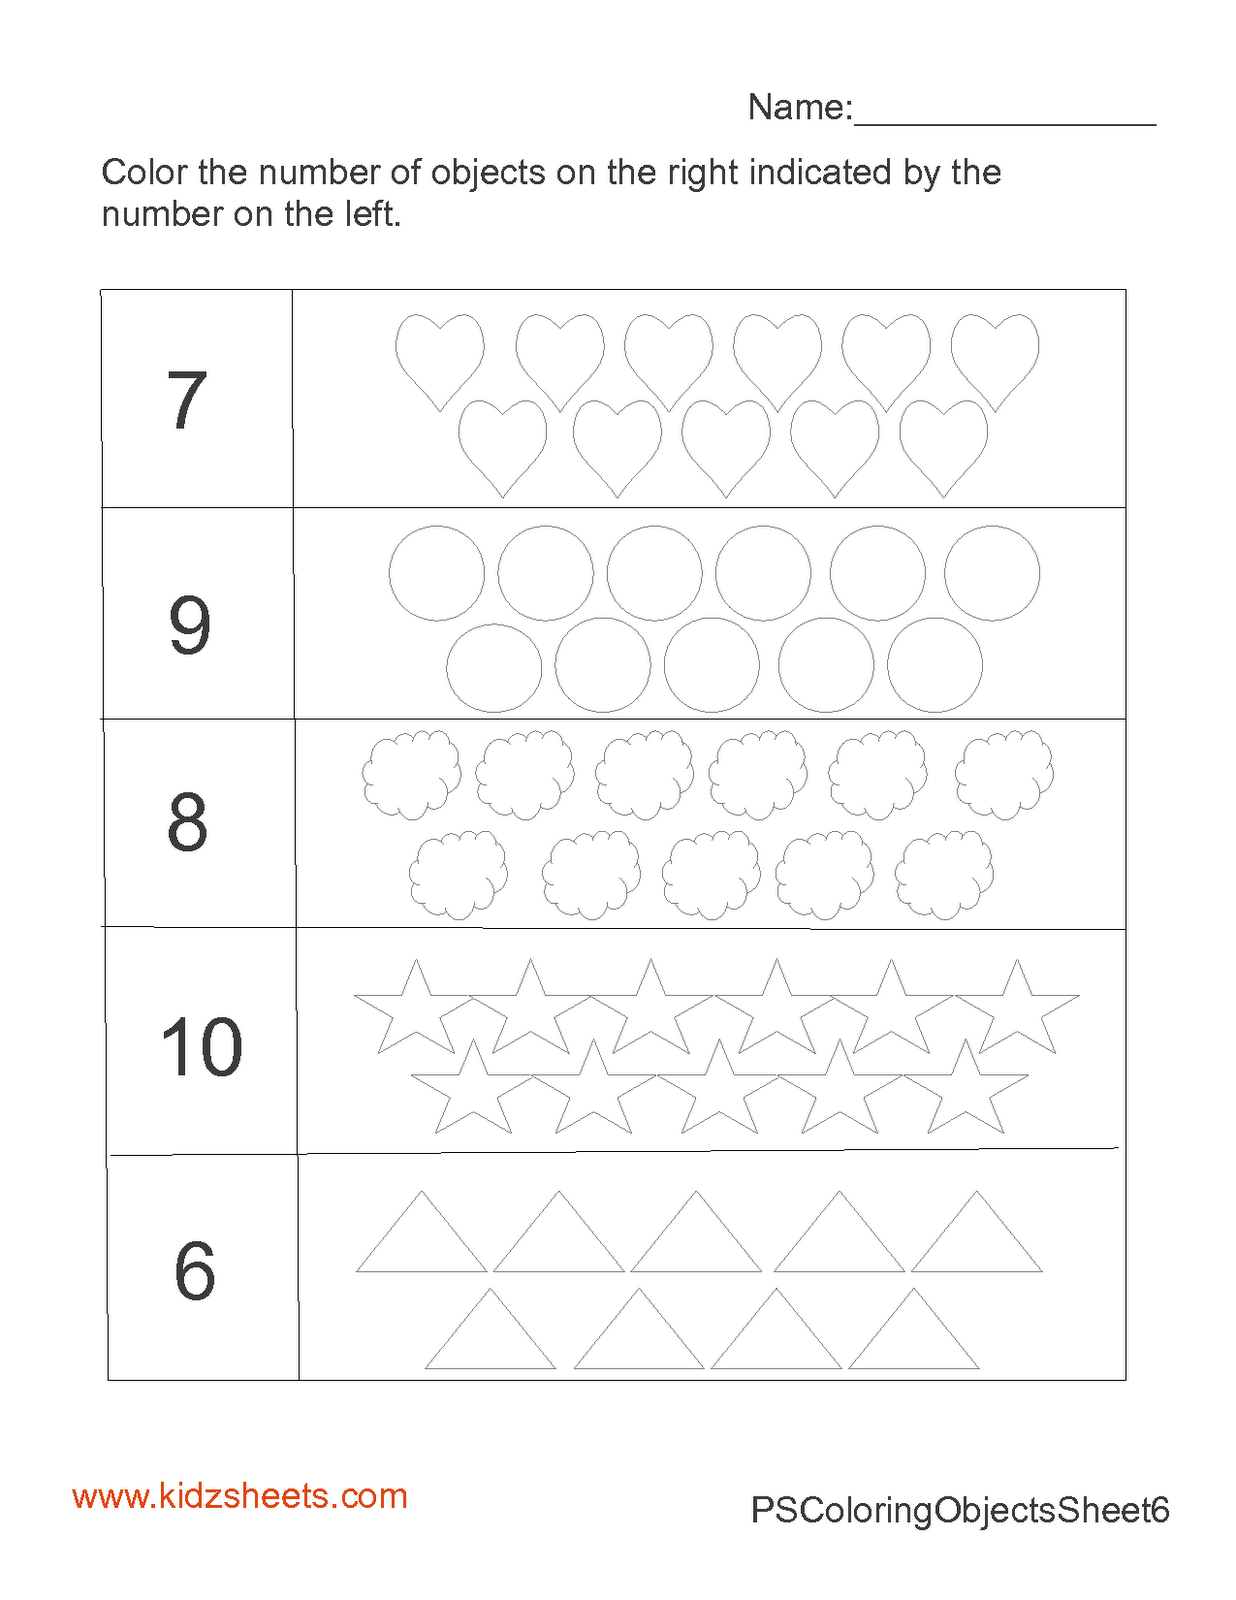 Kidz Worksheets Preschool Count Color 6 10 Worksheet1